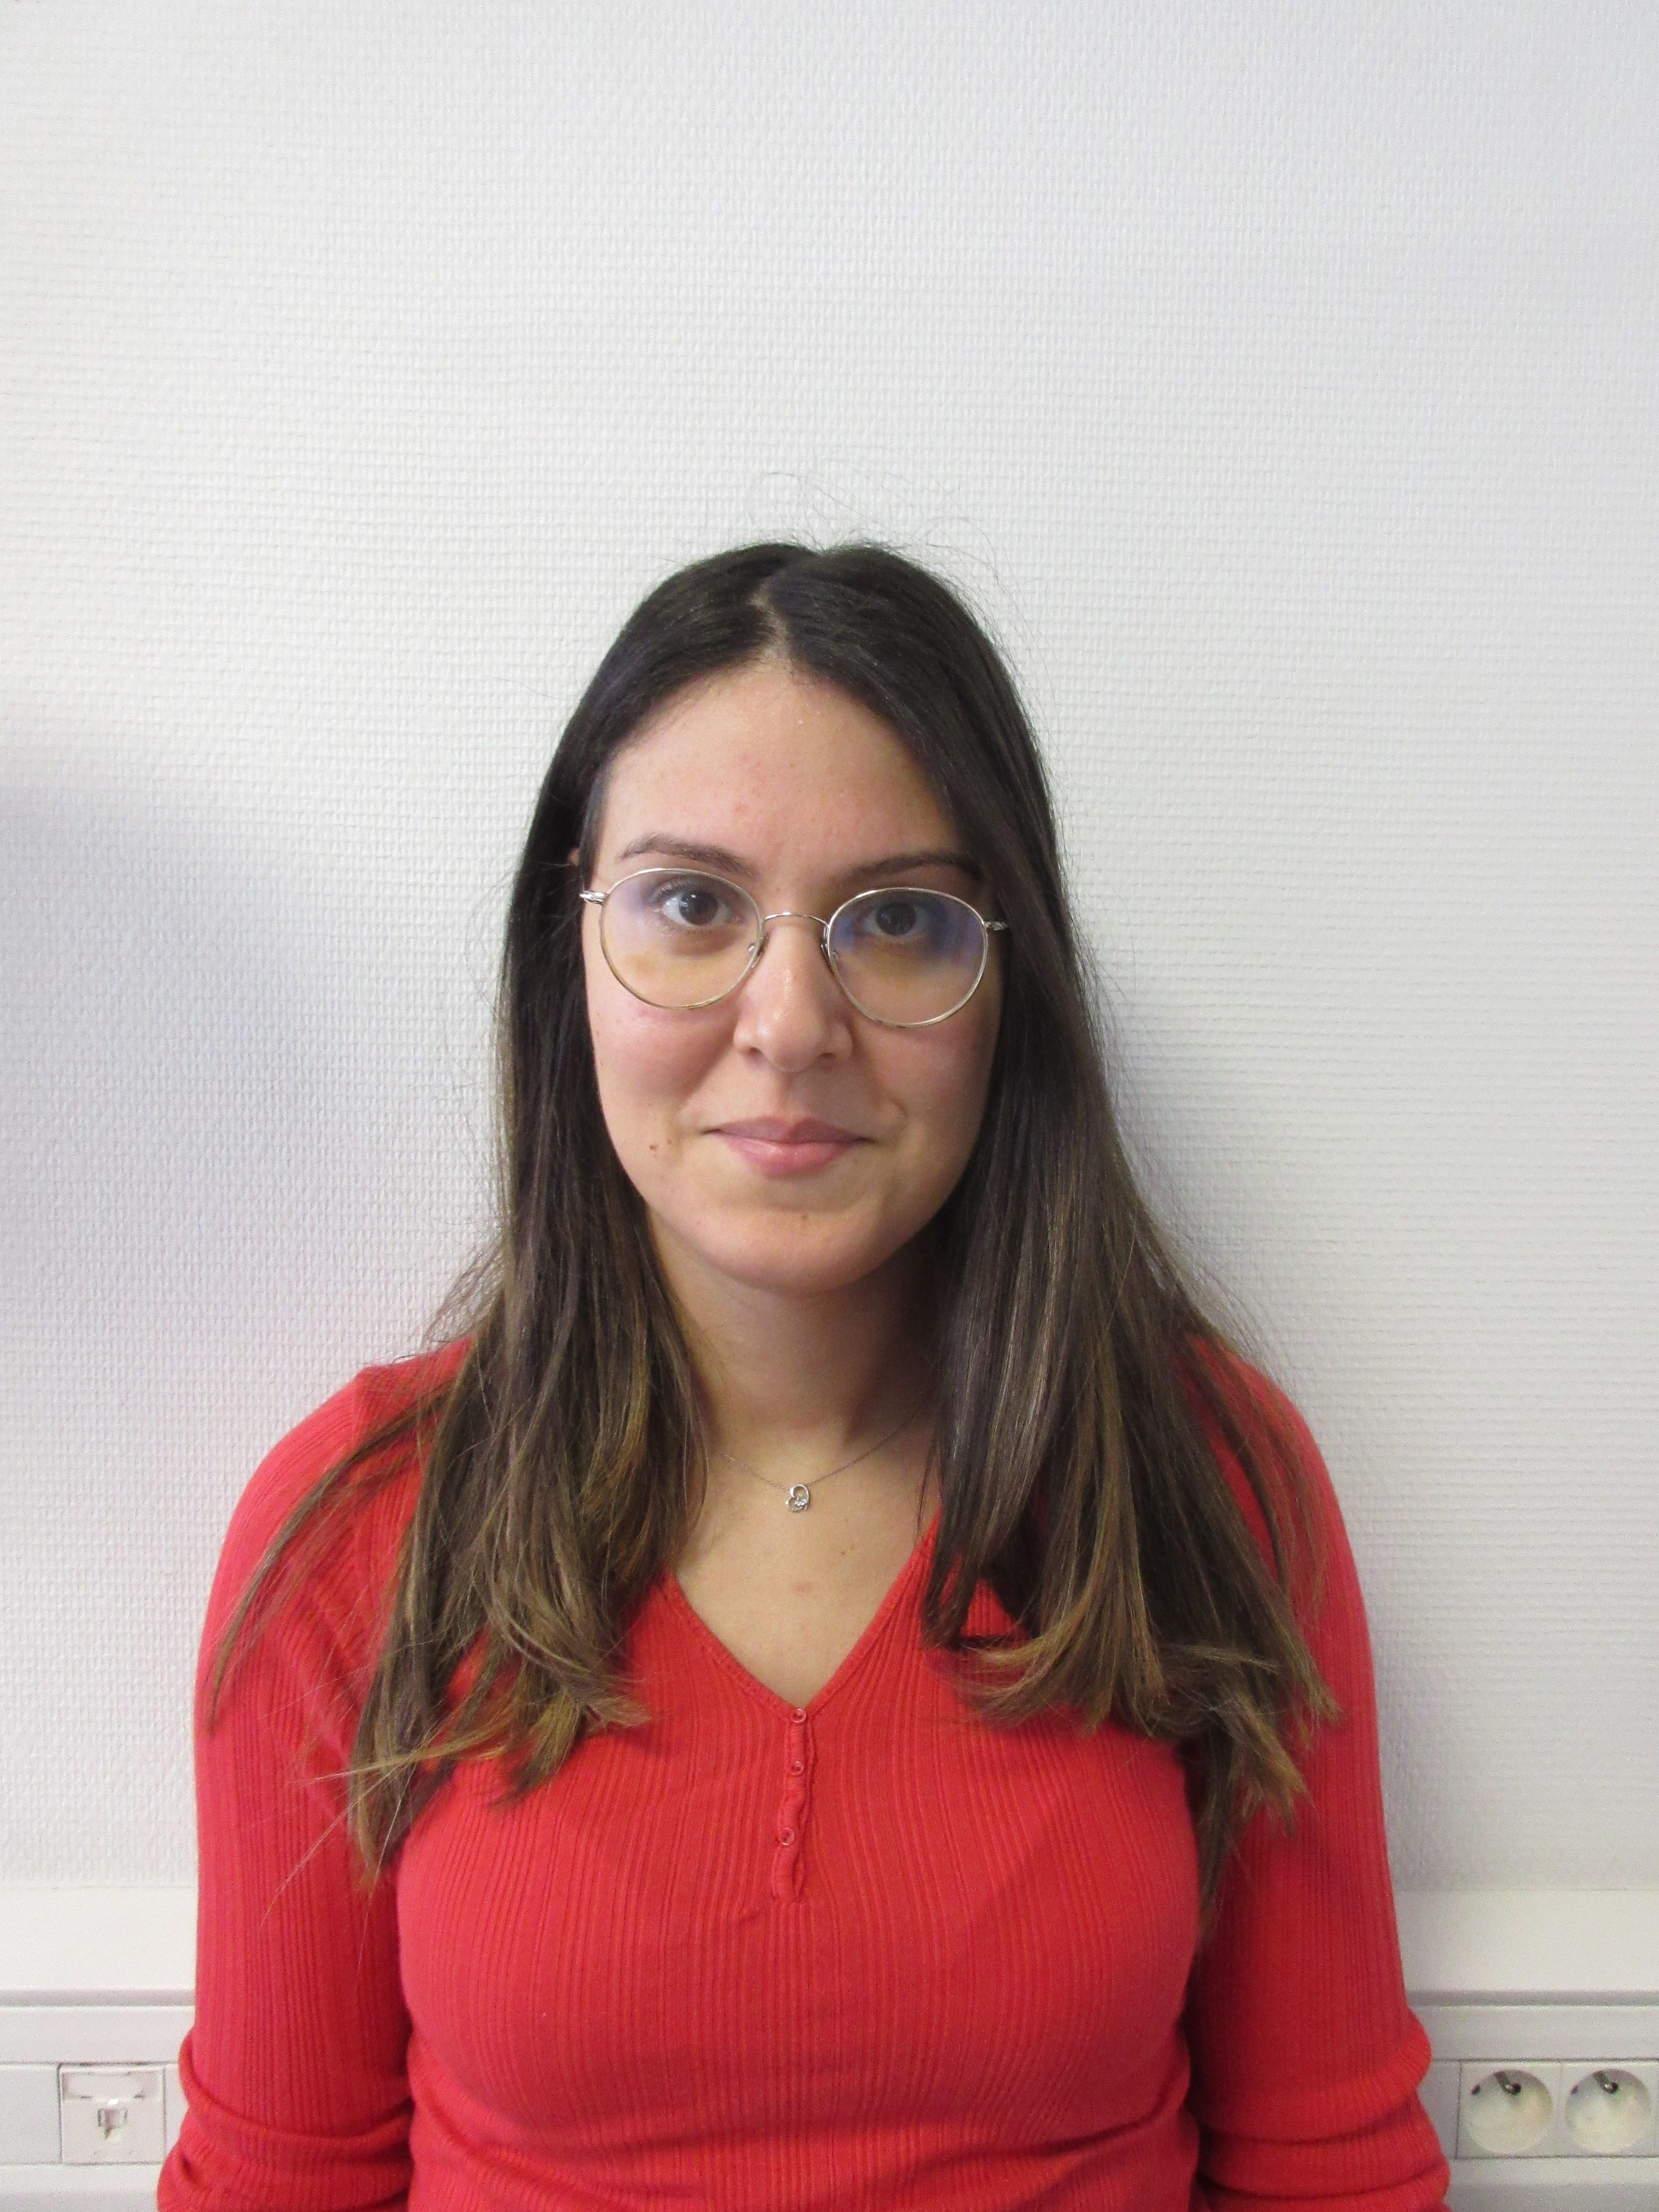 Picture of Donia Bouzouita